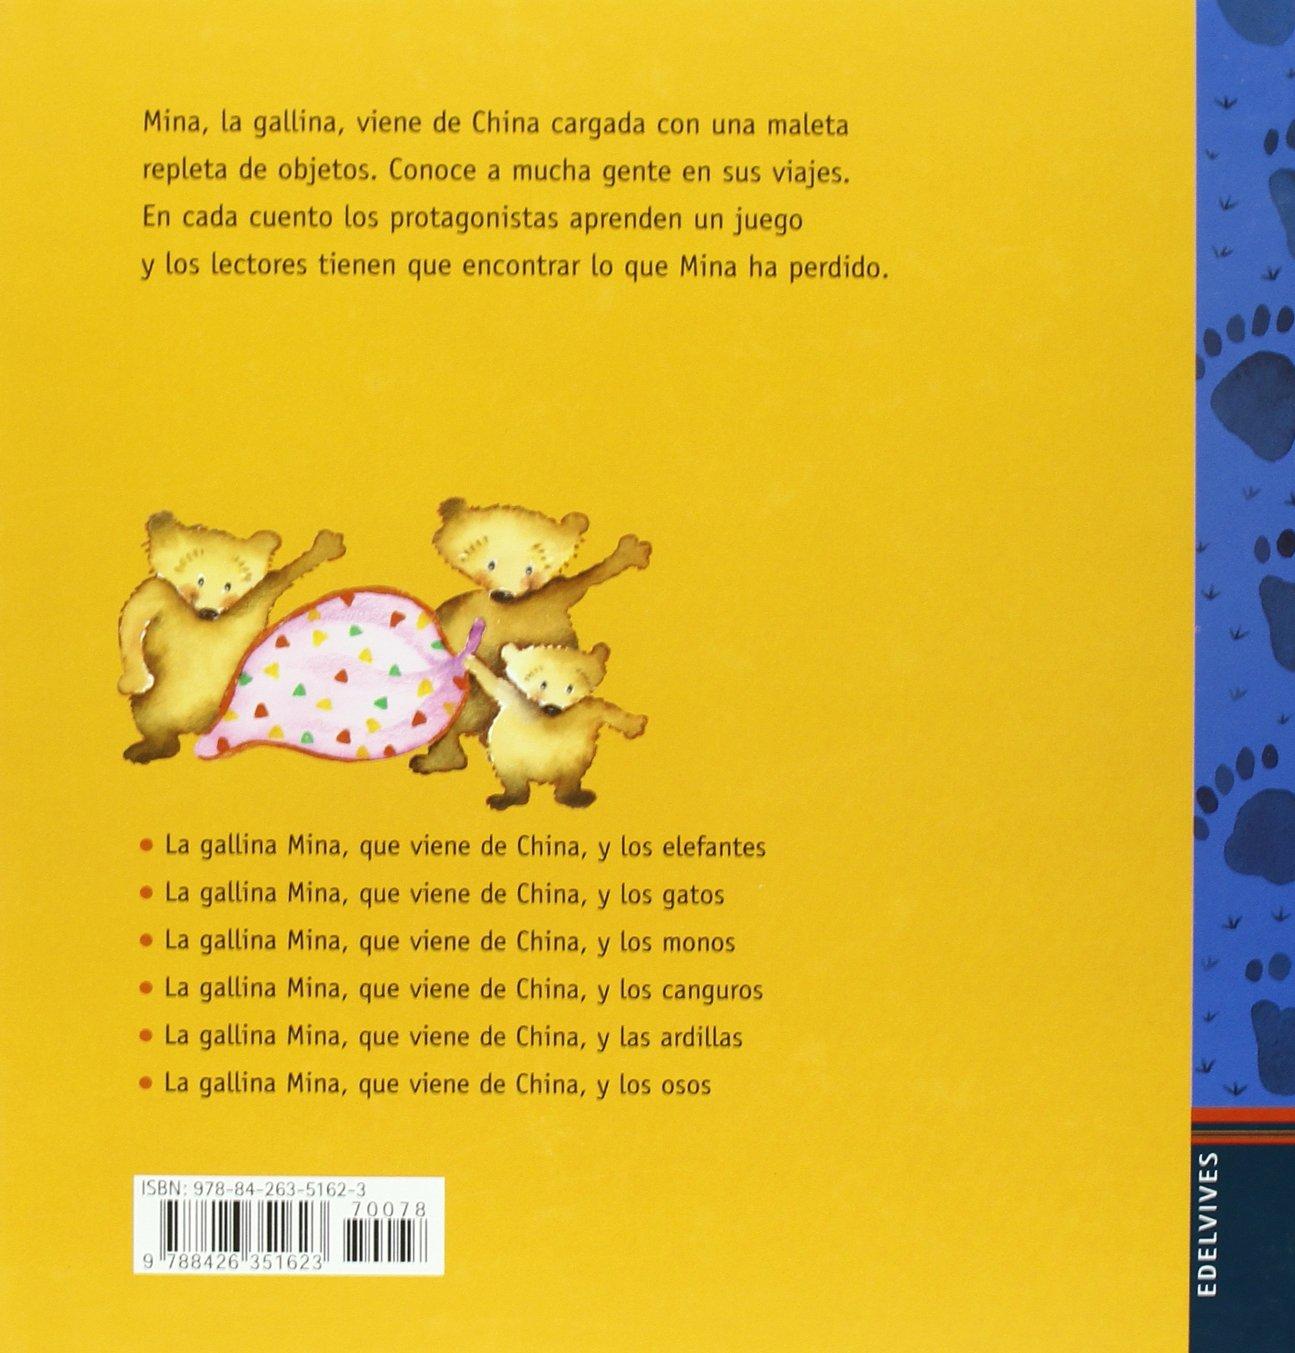 La gallina Mina que viene de China y los osos: Mercè Arànega: 9788426351623: Amazon.com: Books